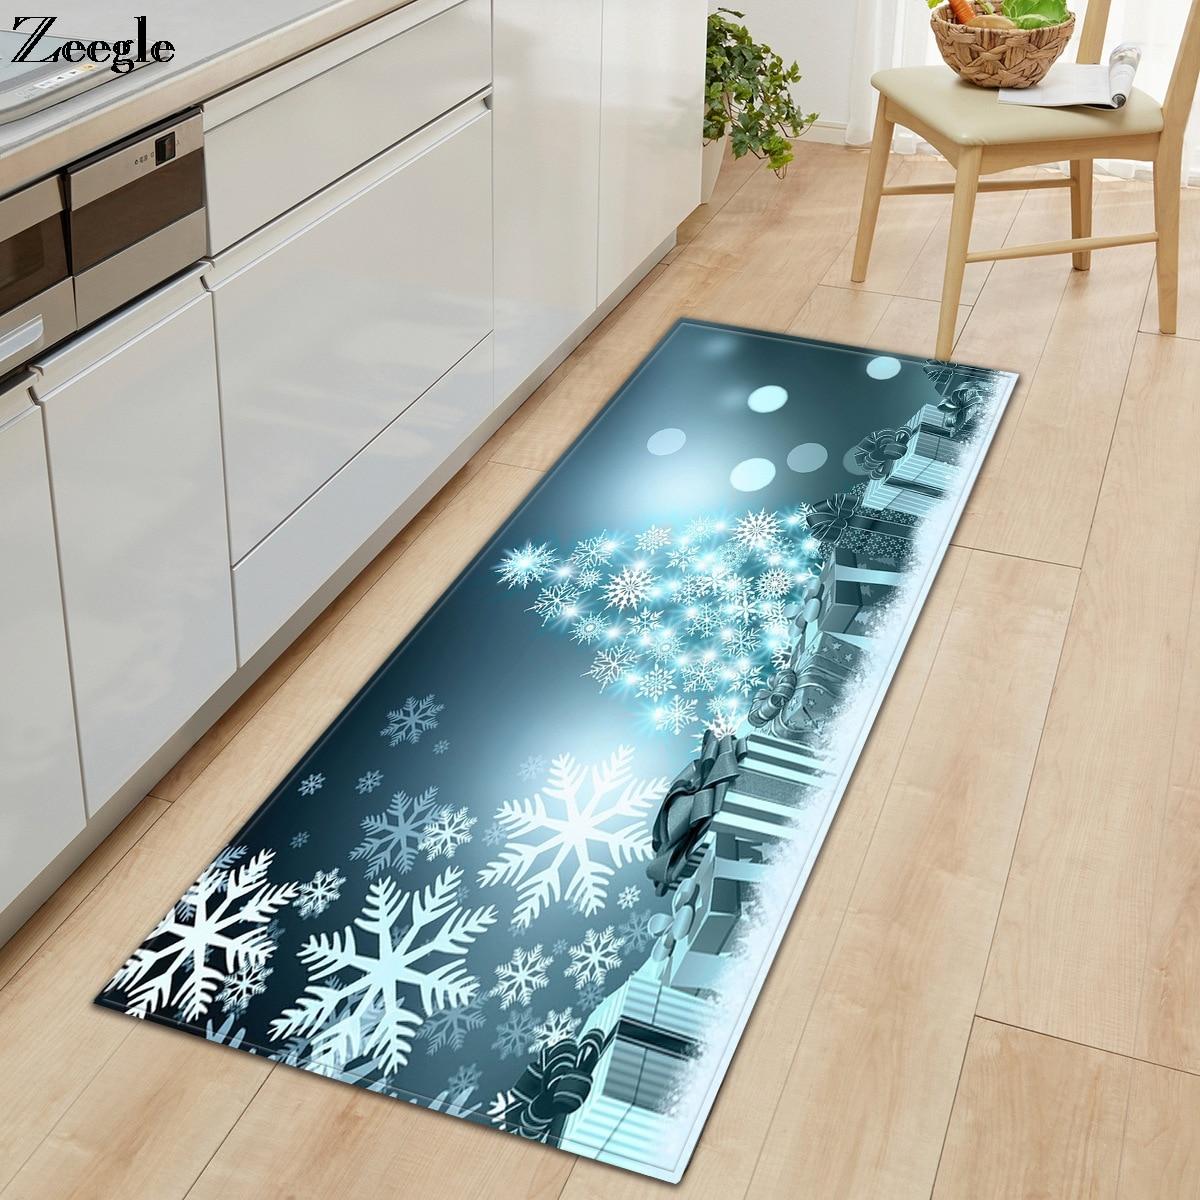 Us 7 06 44 Off Zeegle Christmas Carpet Kitchen Rug Anti Slip Hallway Floor Rug Living Room Carpet Washable Bathroom Doormat Bedside Carpet Mat In